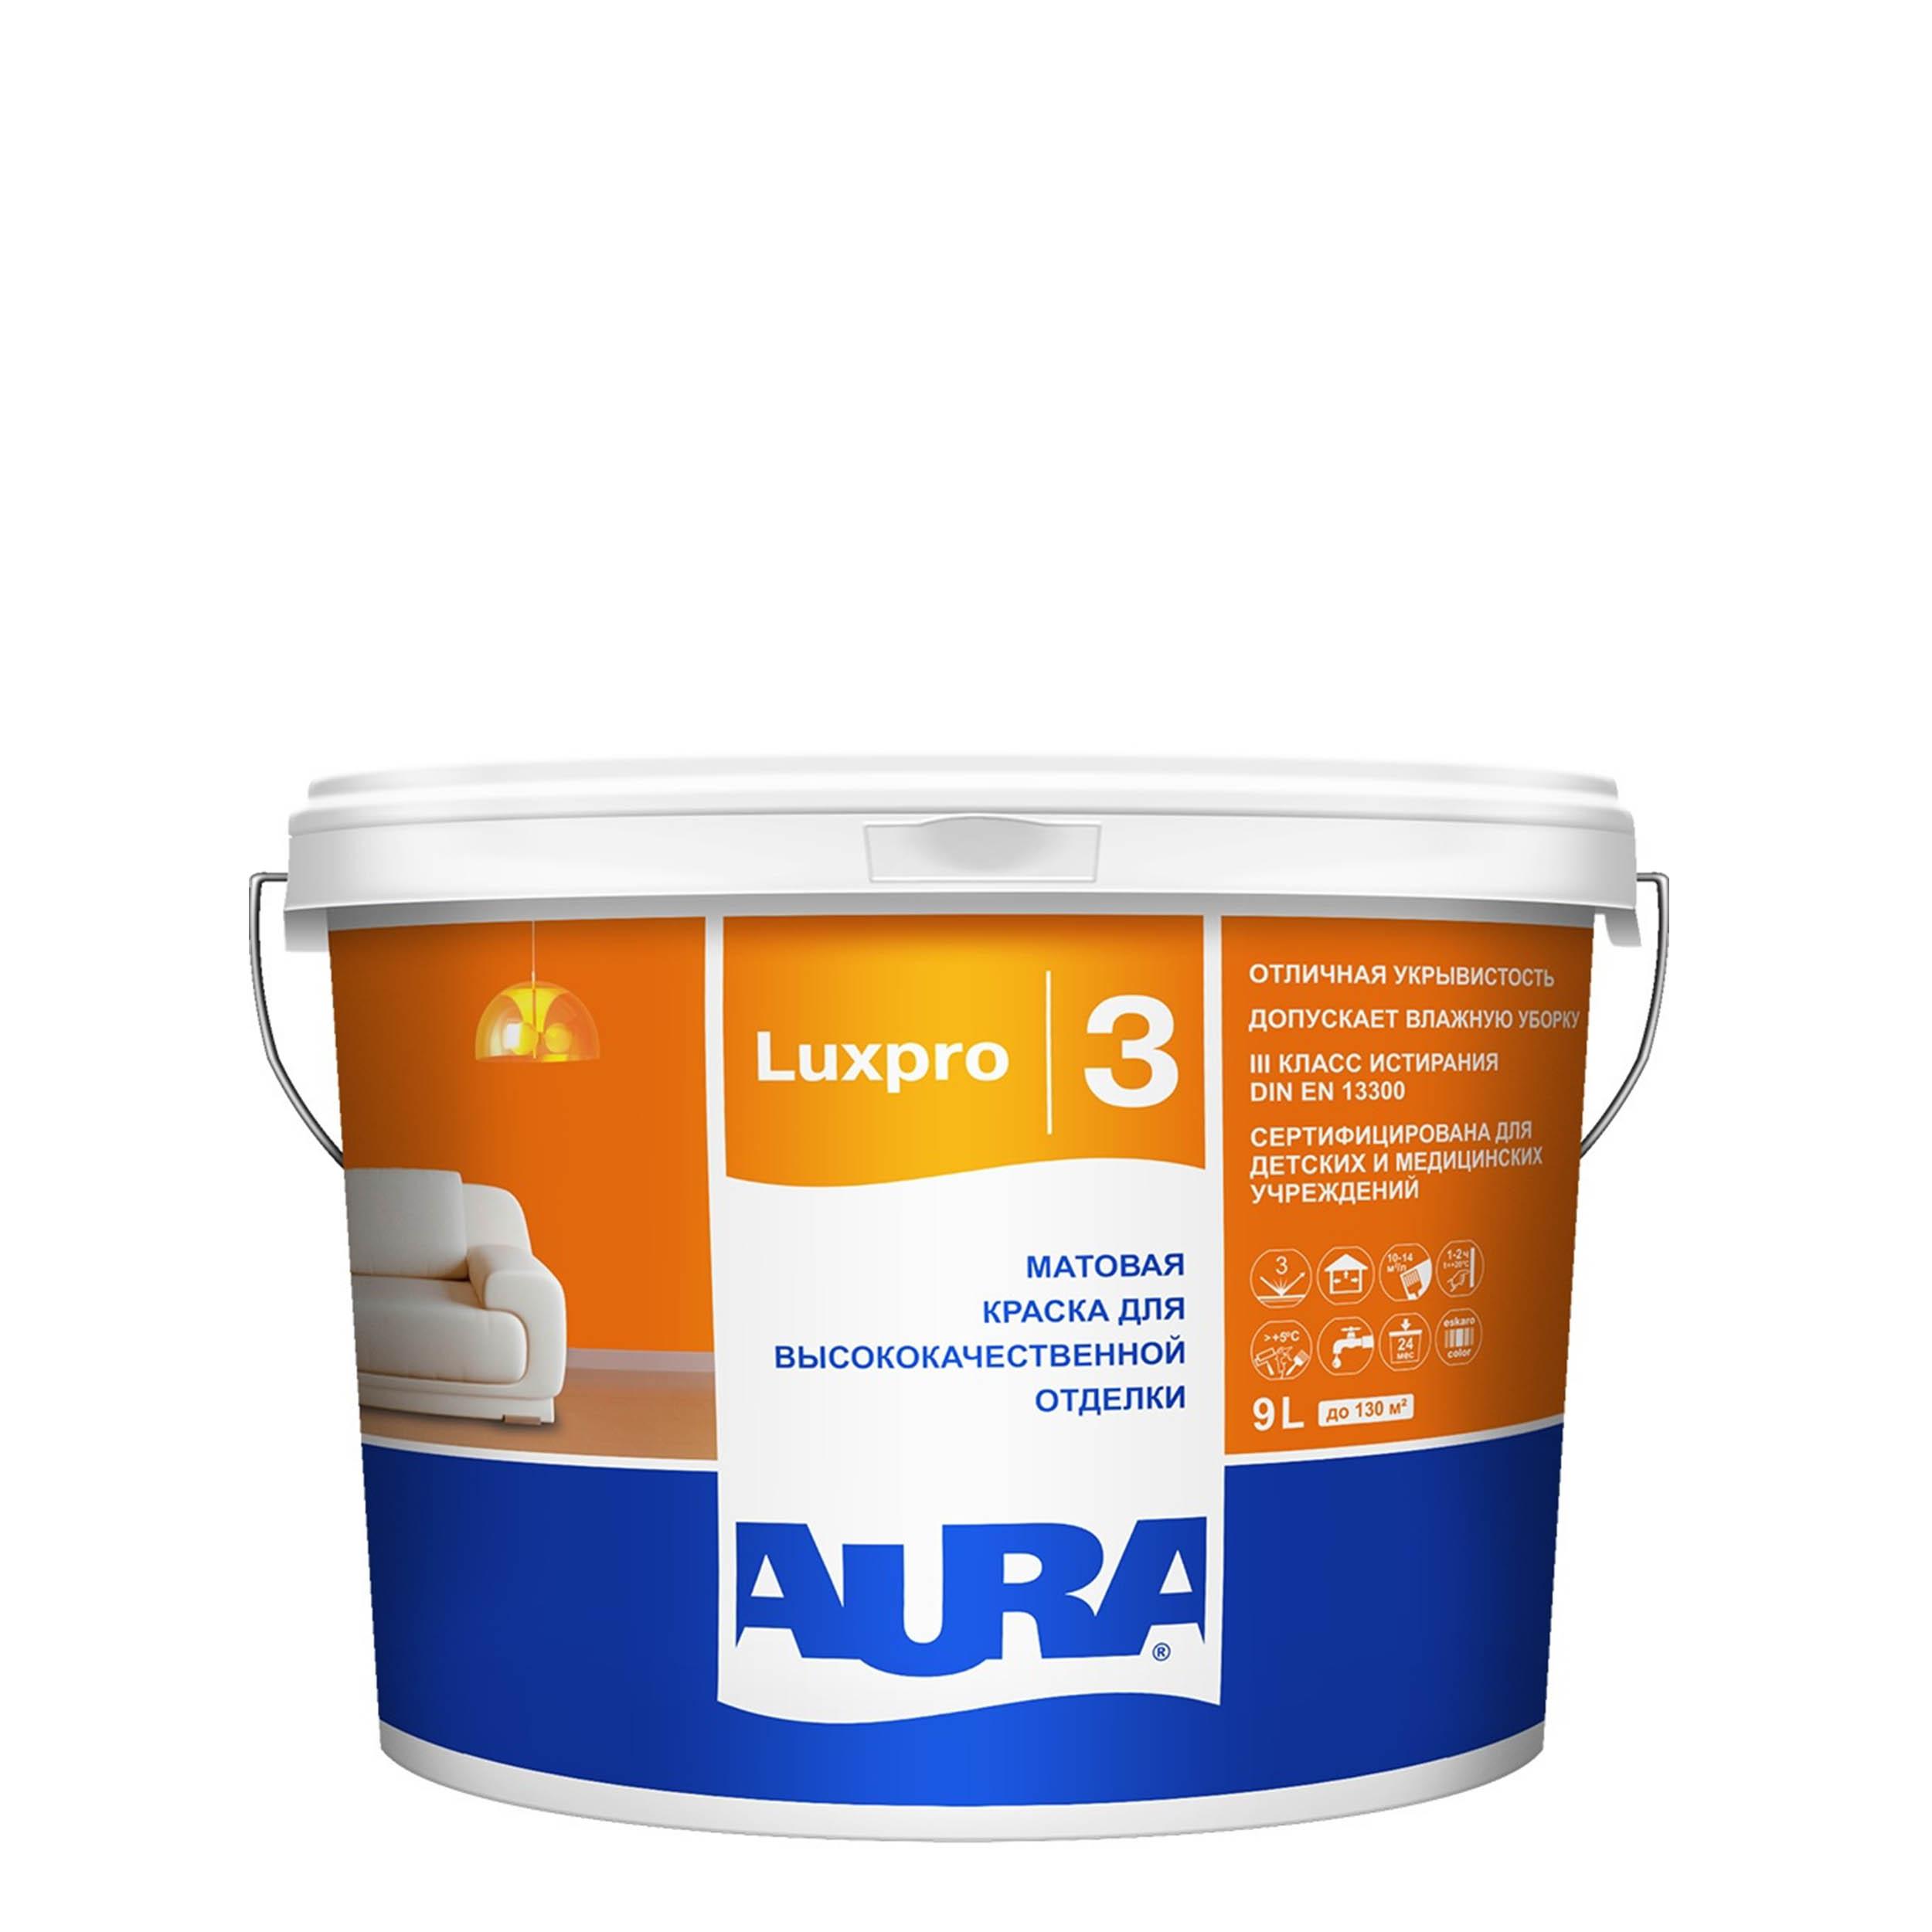 Фото 3 - Краска интерьерная, Aura LuxPRO 3, RAL 7040, 11 кг.